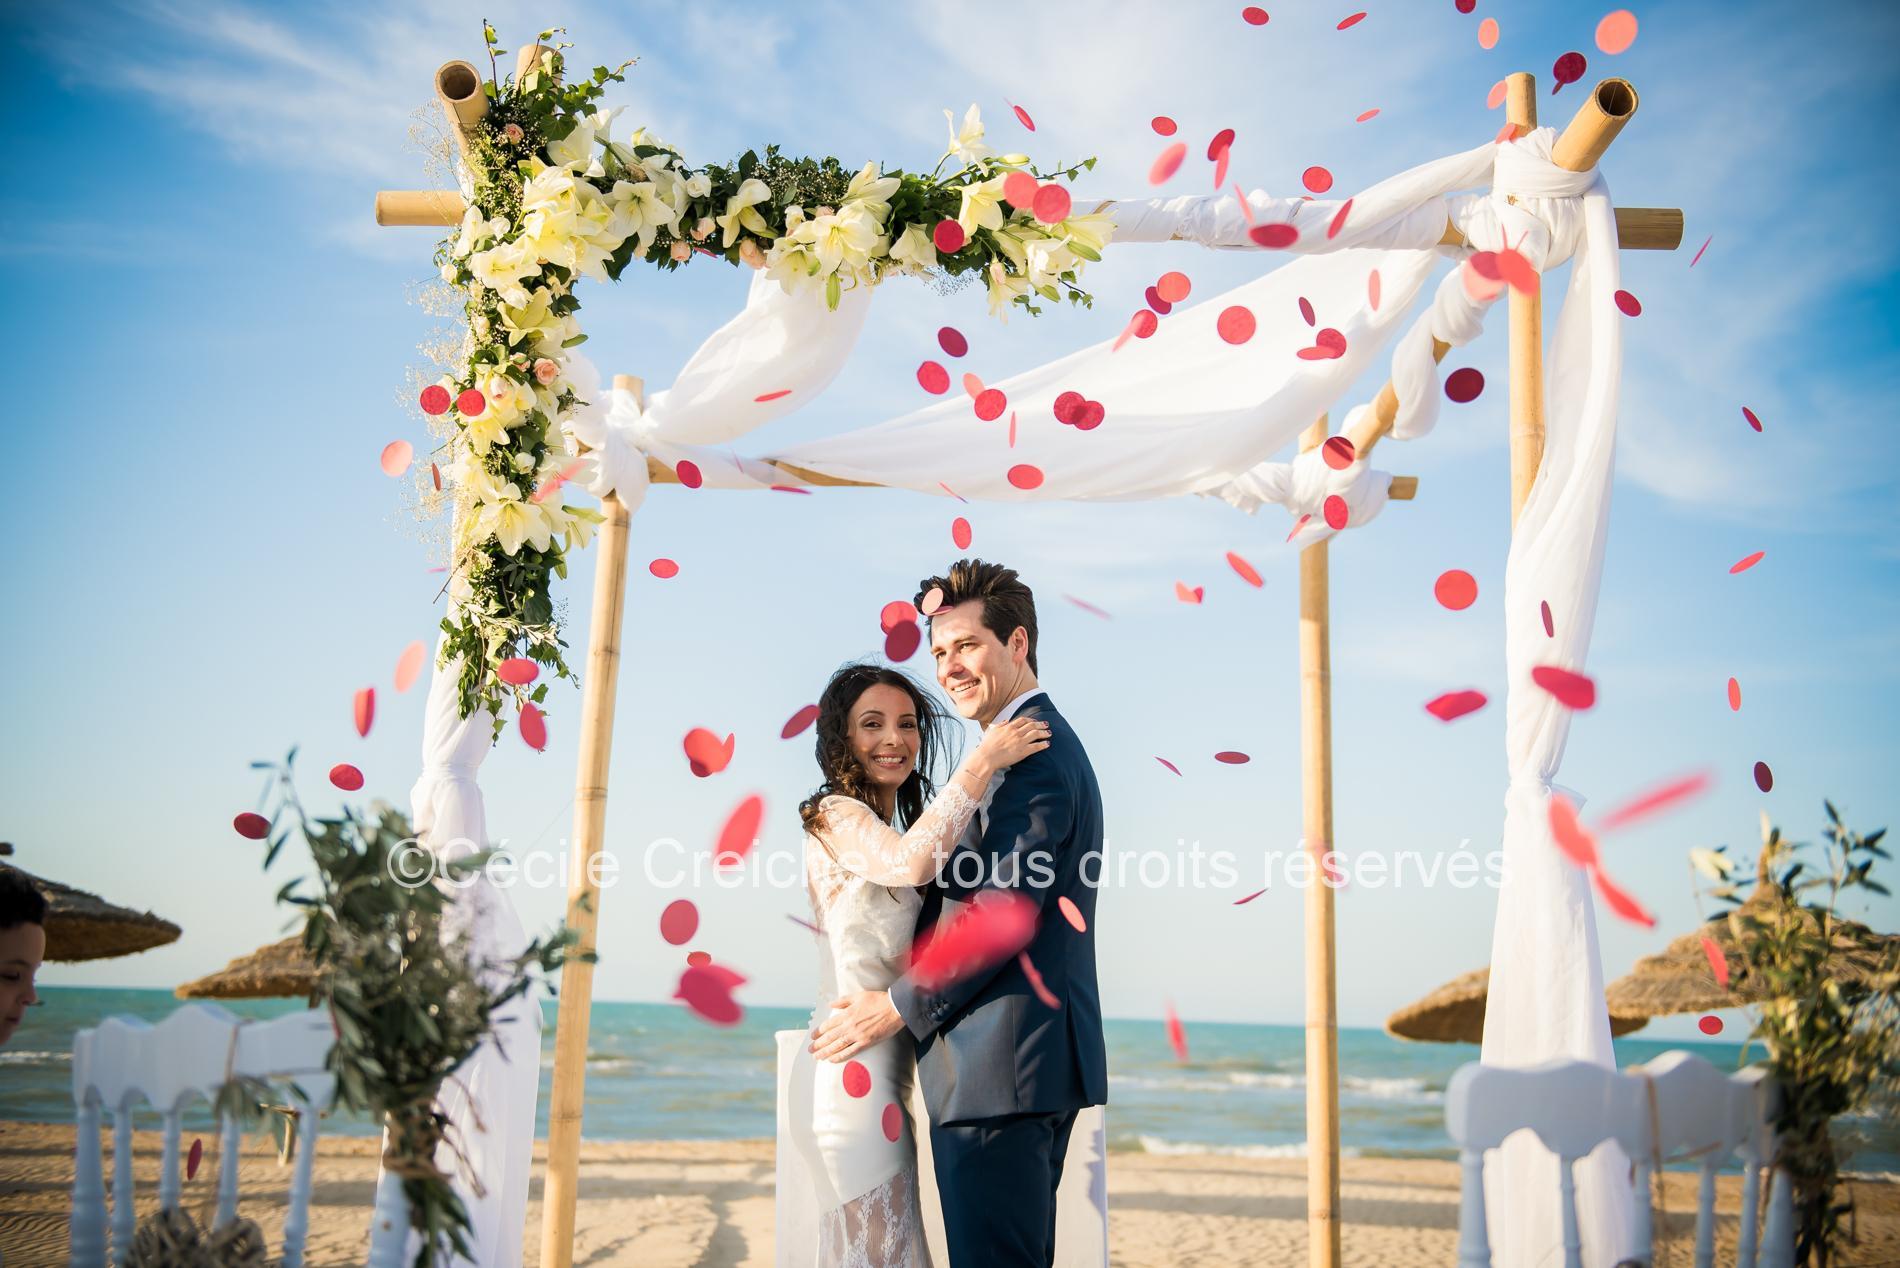 Photographe mariage maroc-8